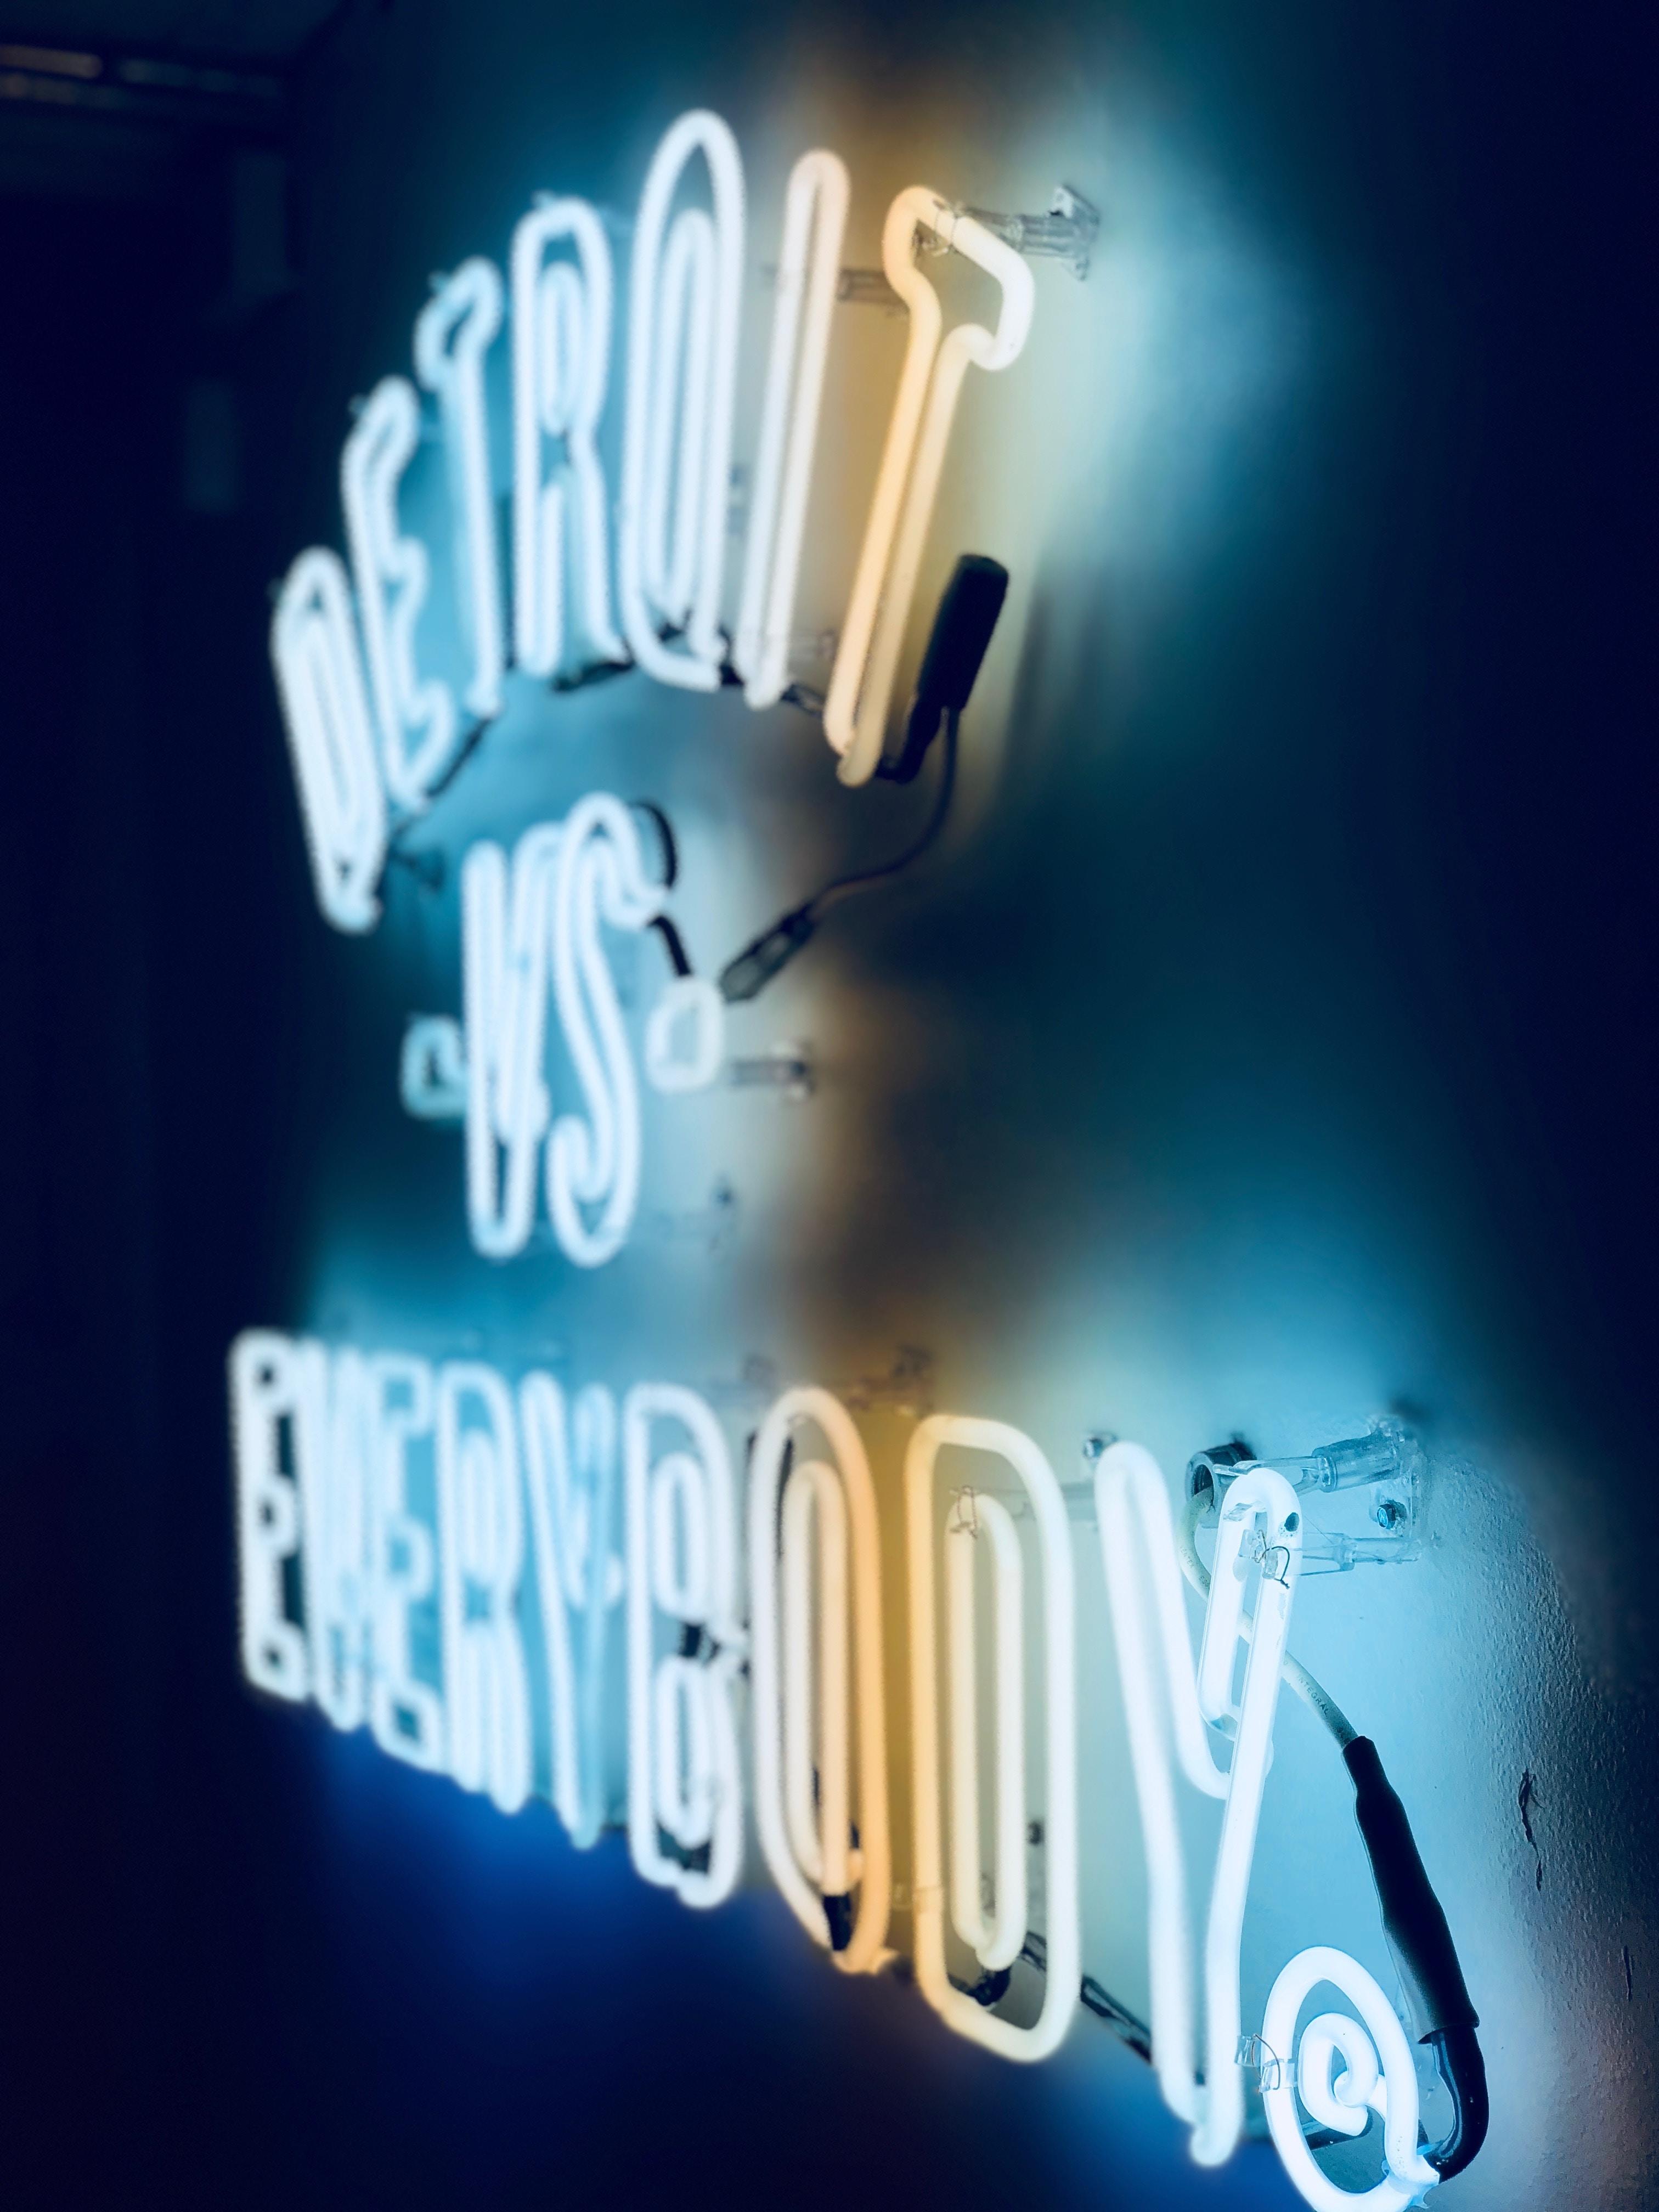 Detroit vs Everybody neon light signage